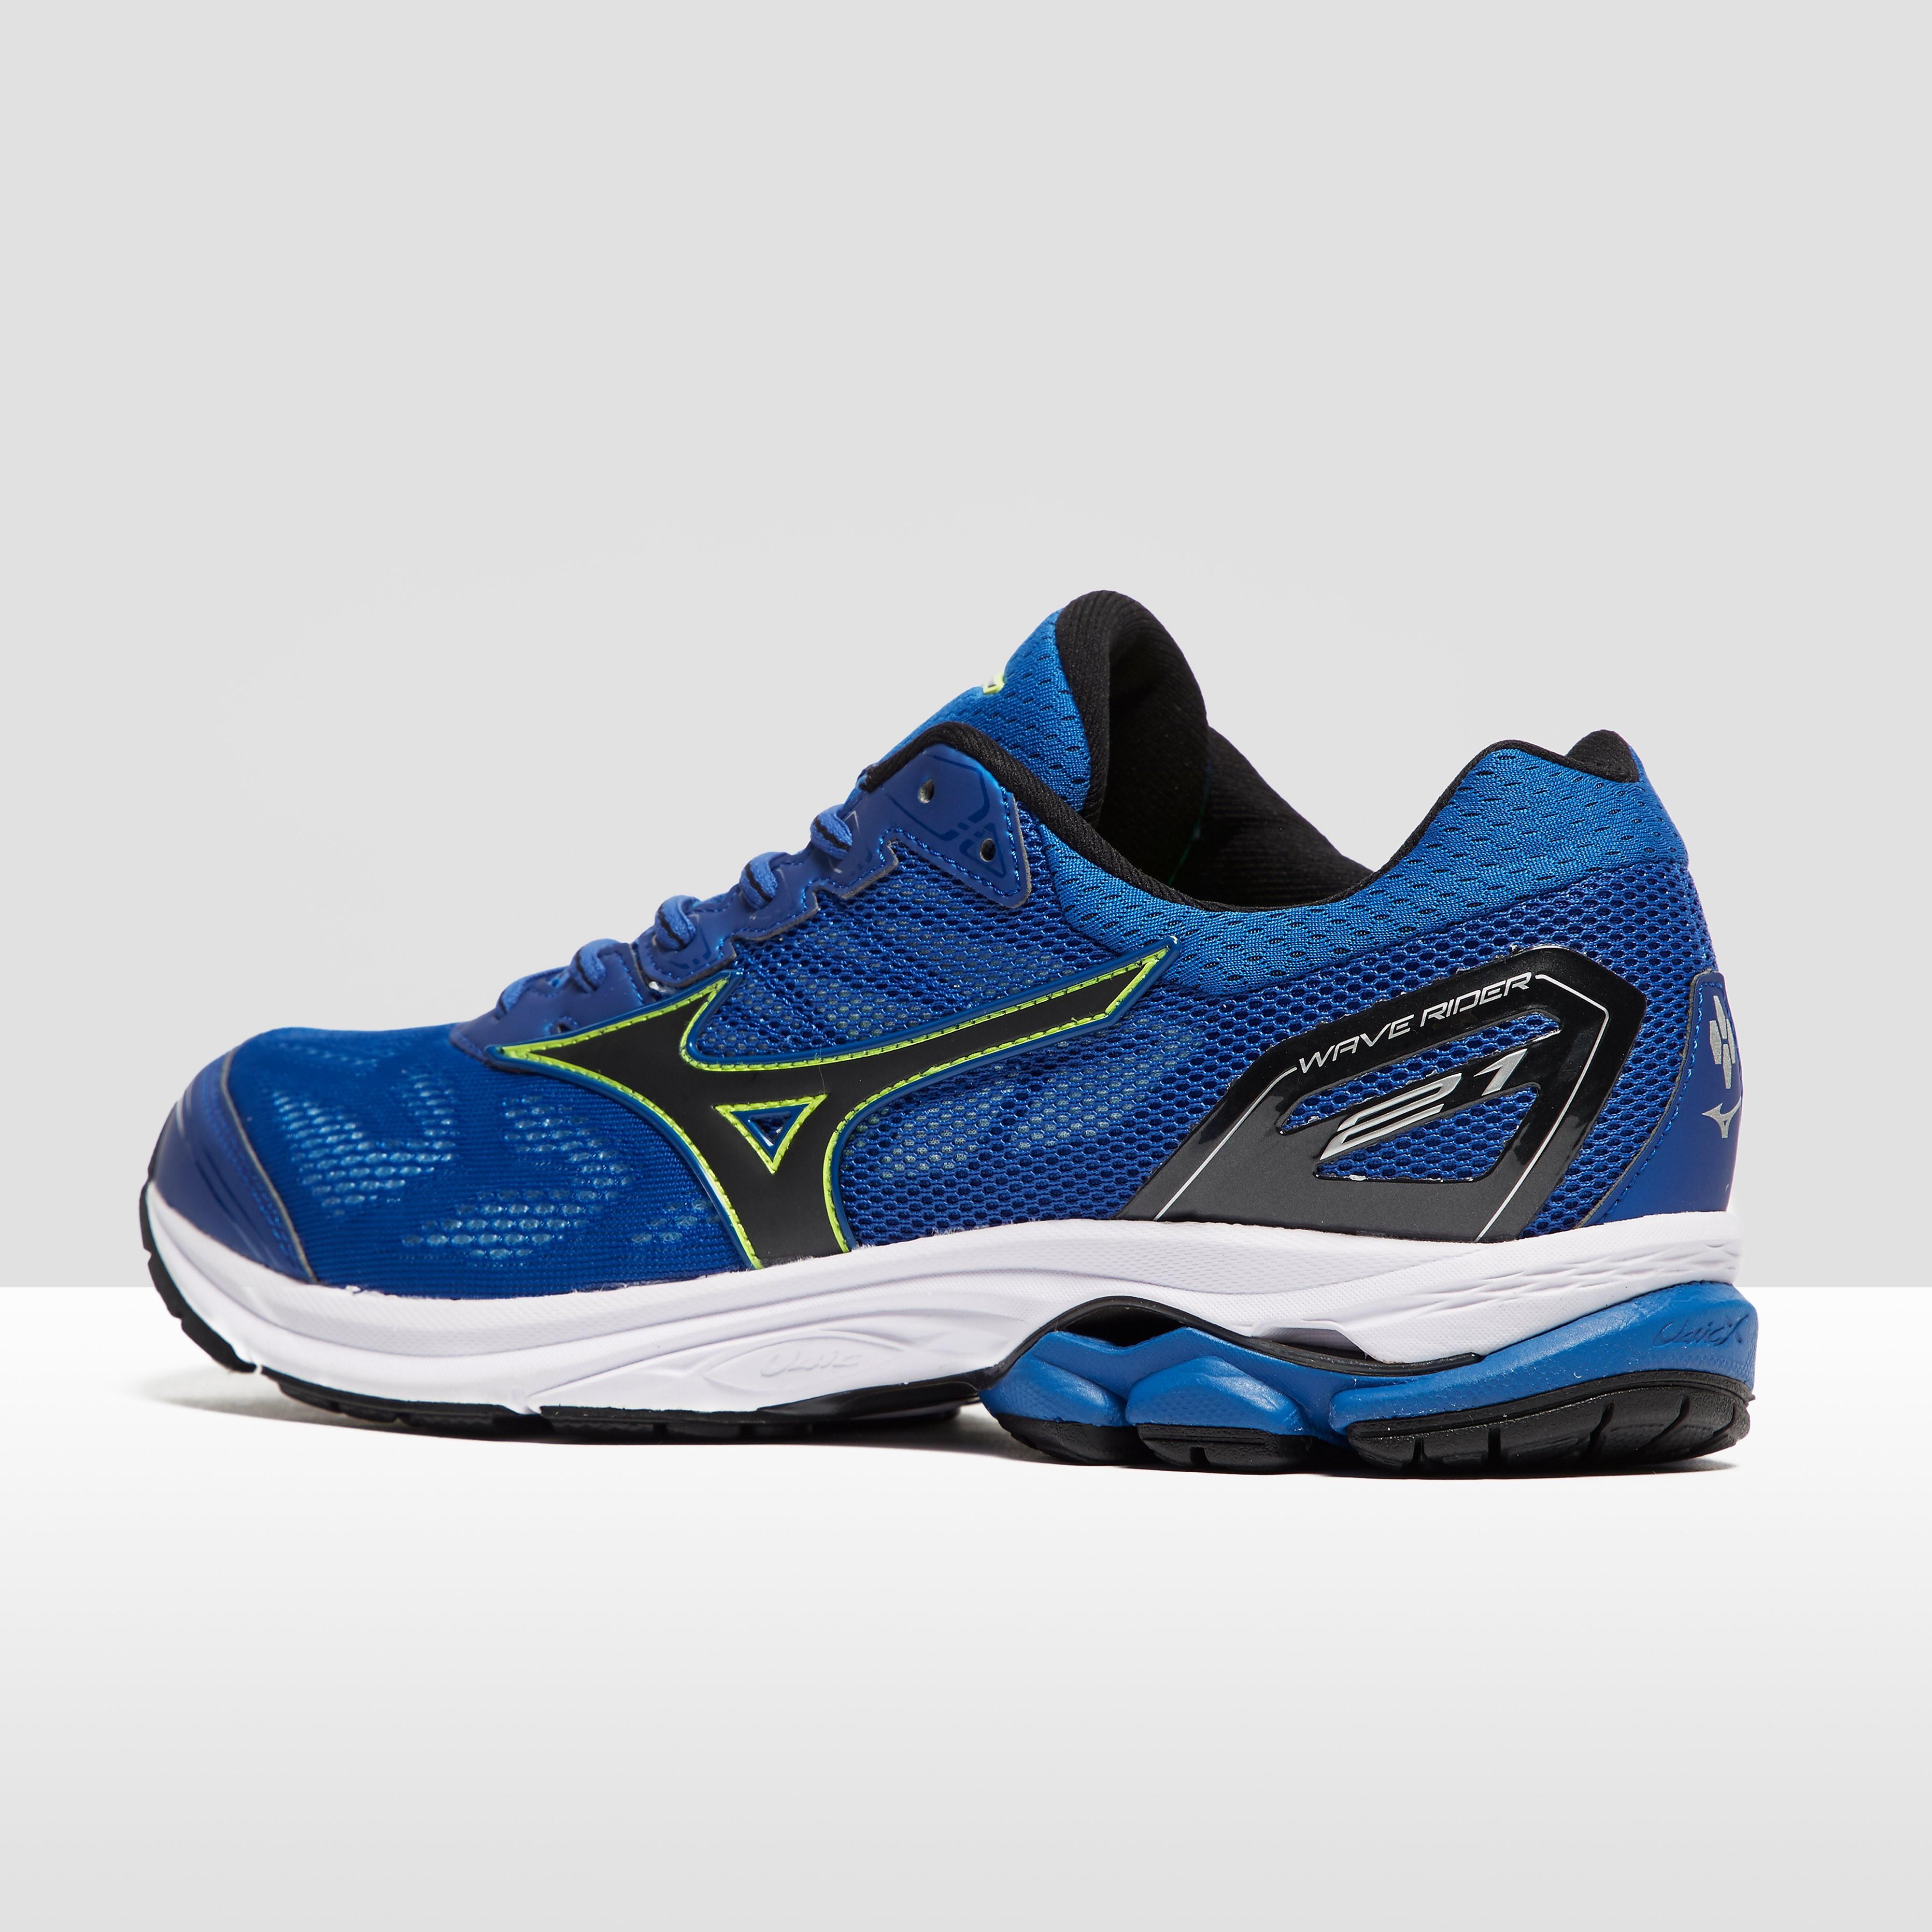 Mizuno Wave Rider 21 Men's Running Shoes